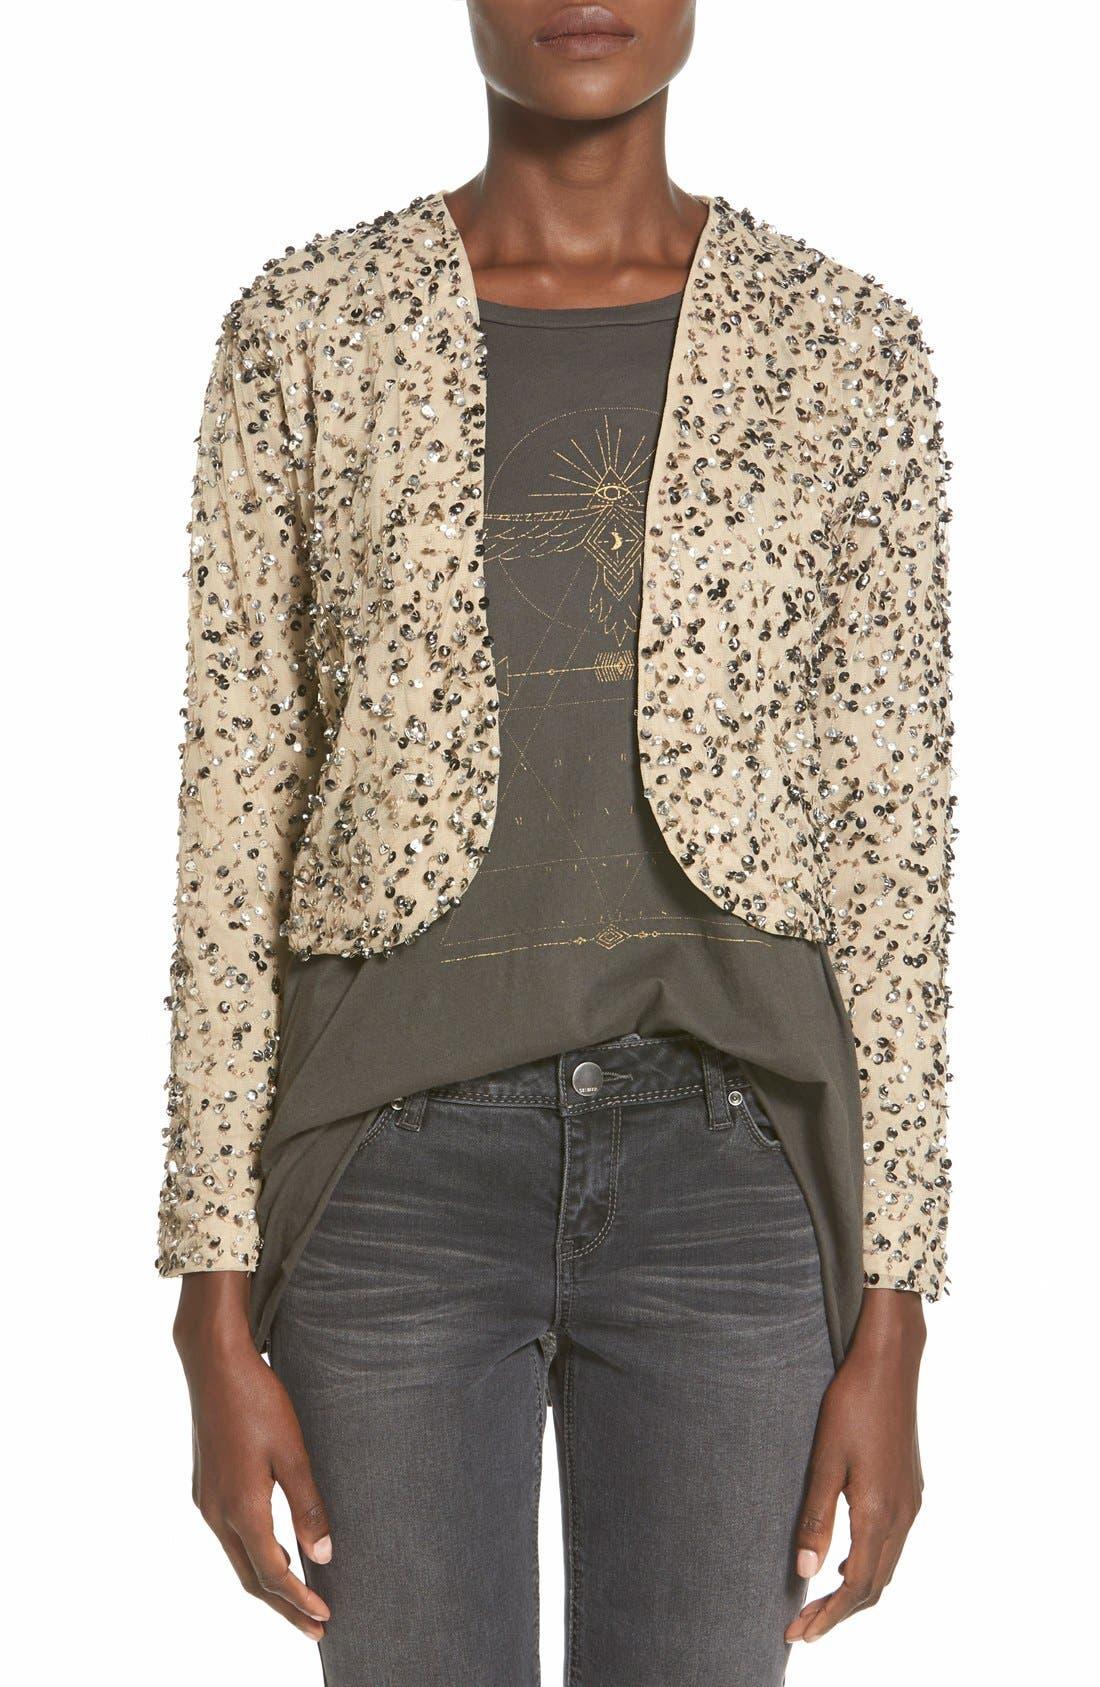 Alternate Image 1 Selected - Billabong 'Eyes on Me' Sequin Cutaway Jacket